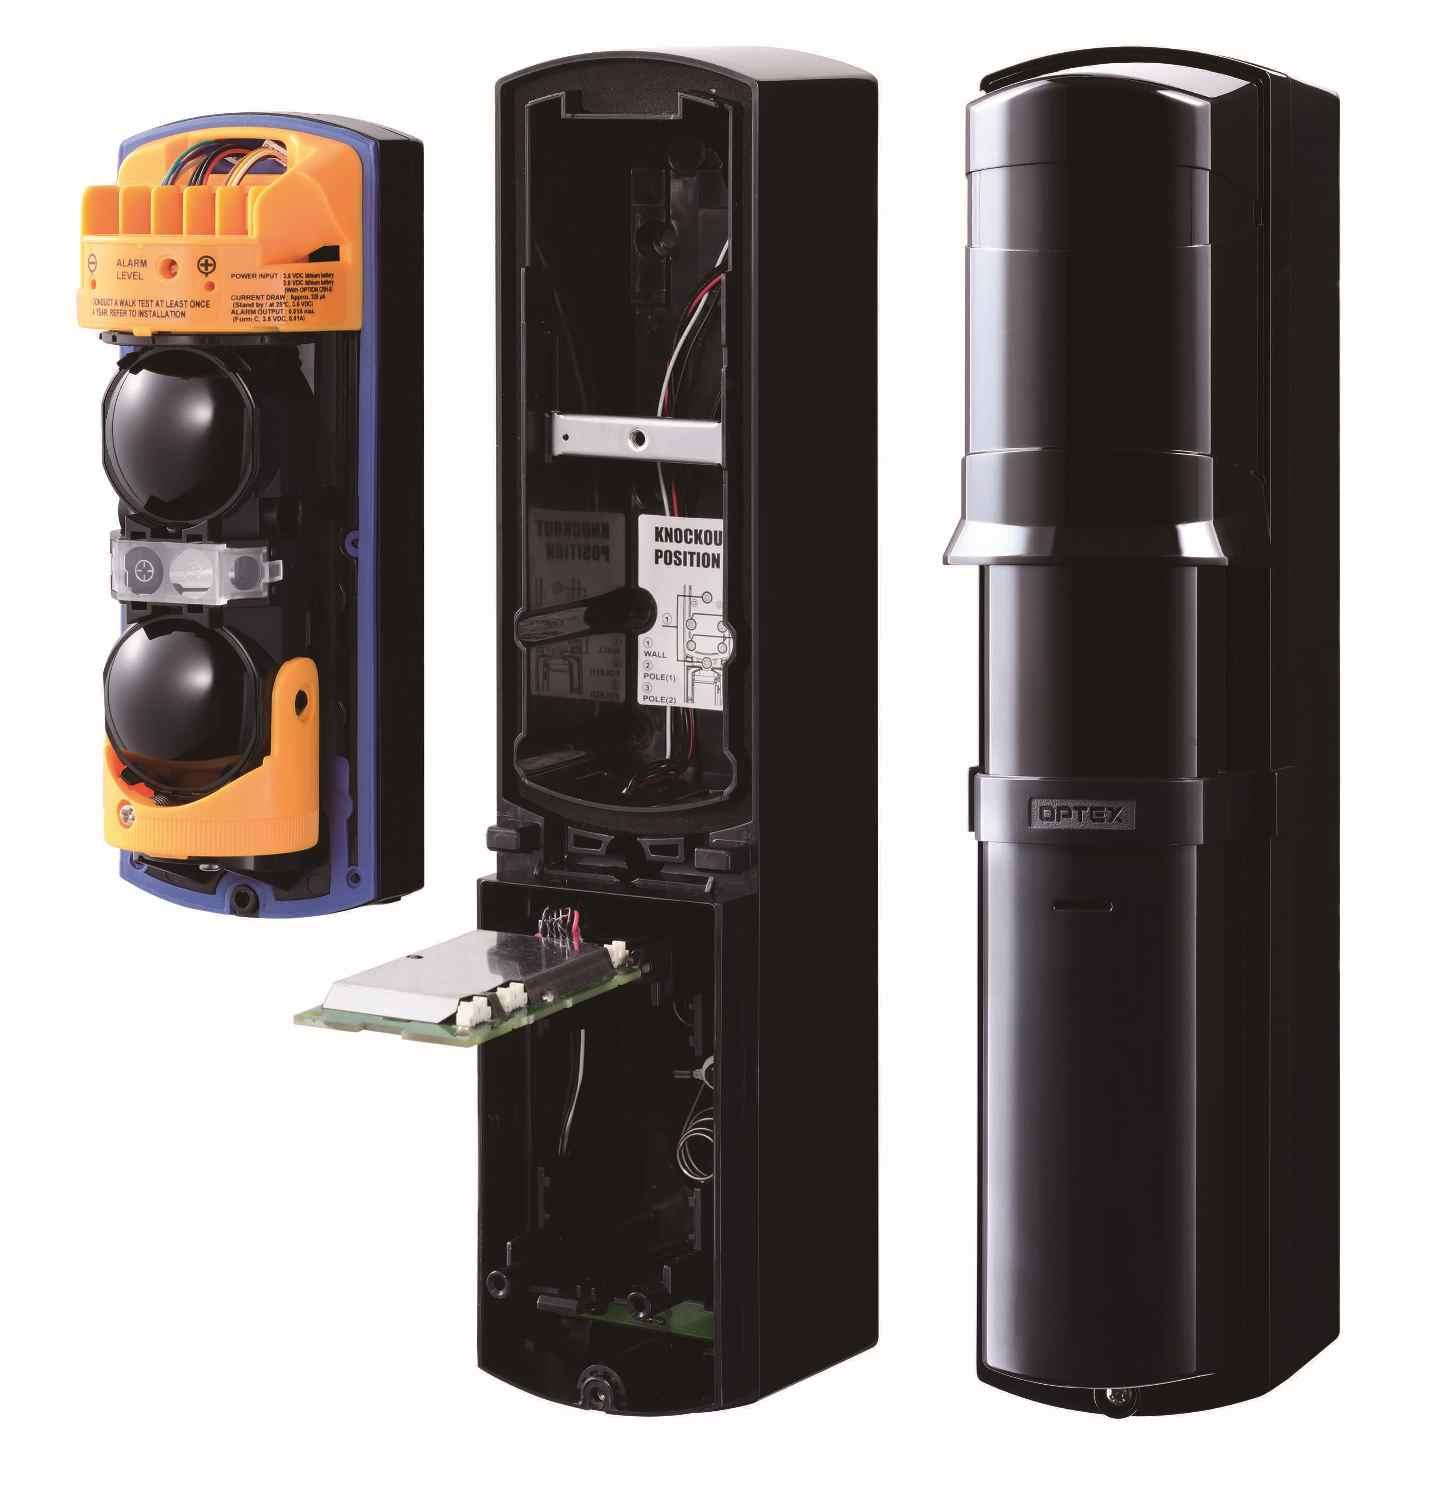 SL-TNR active infrared sensor